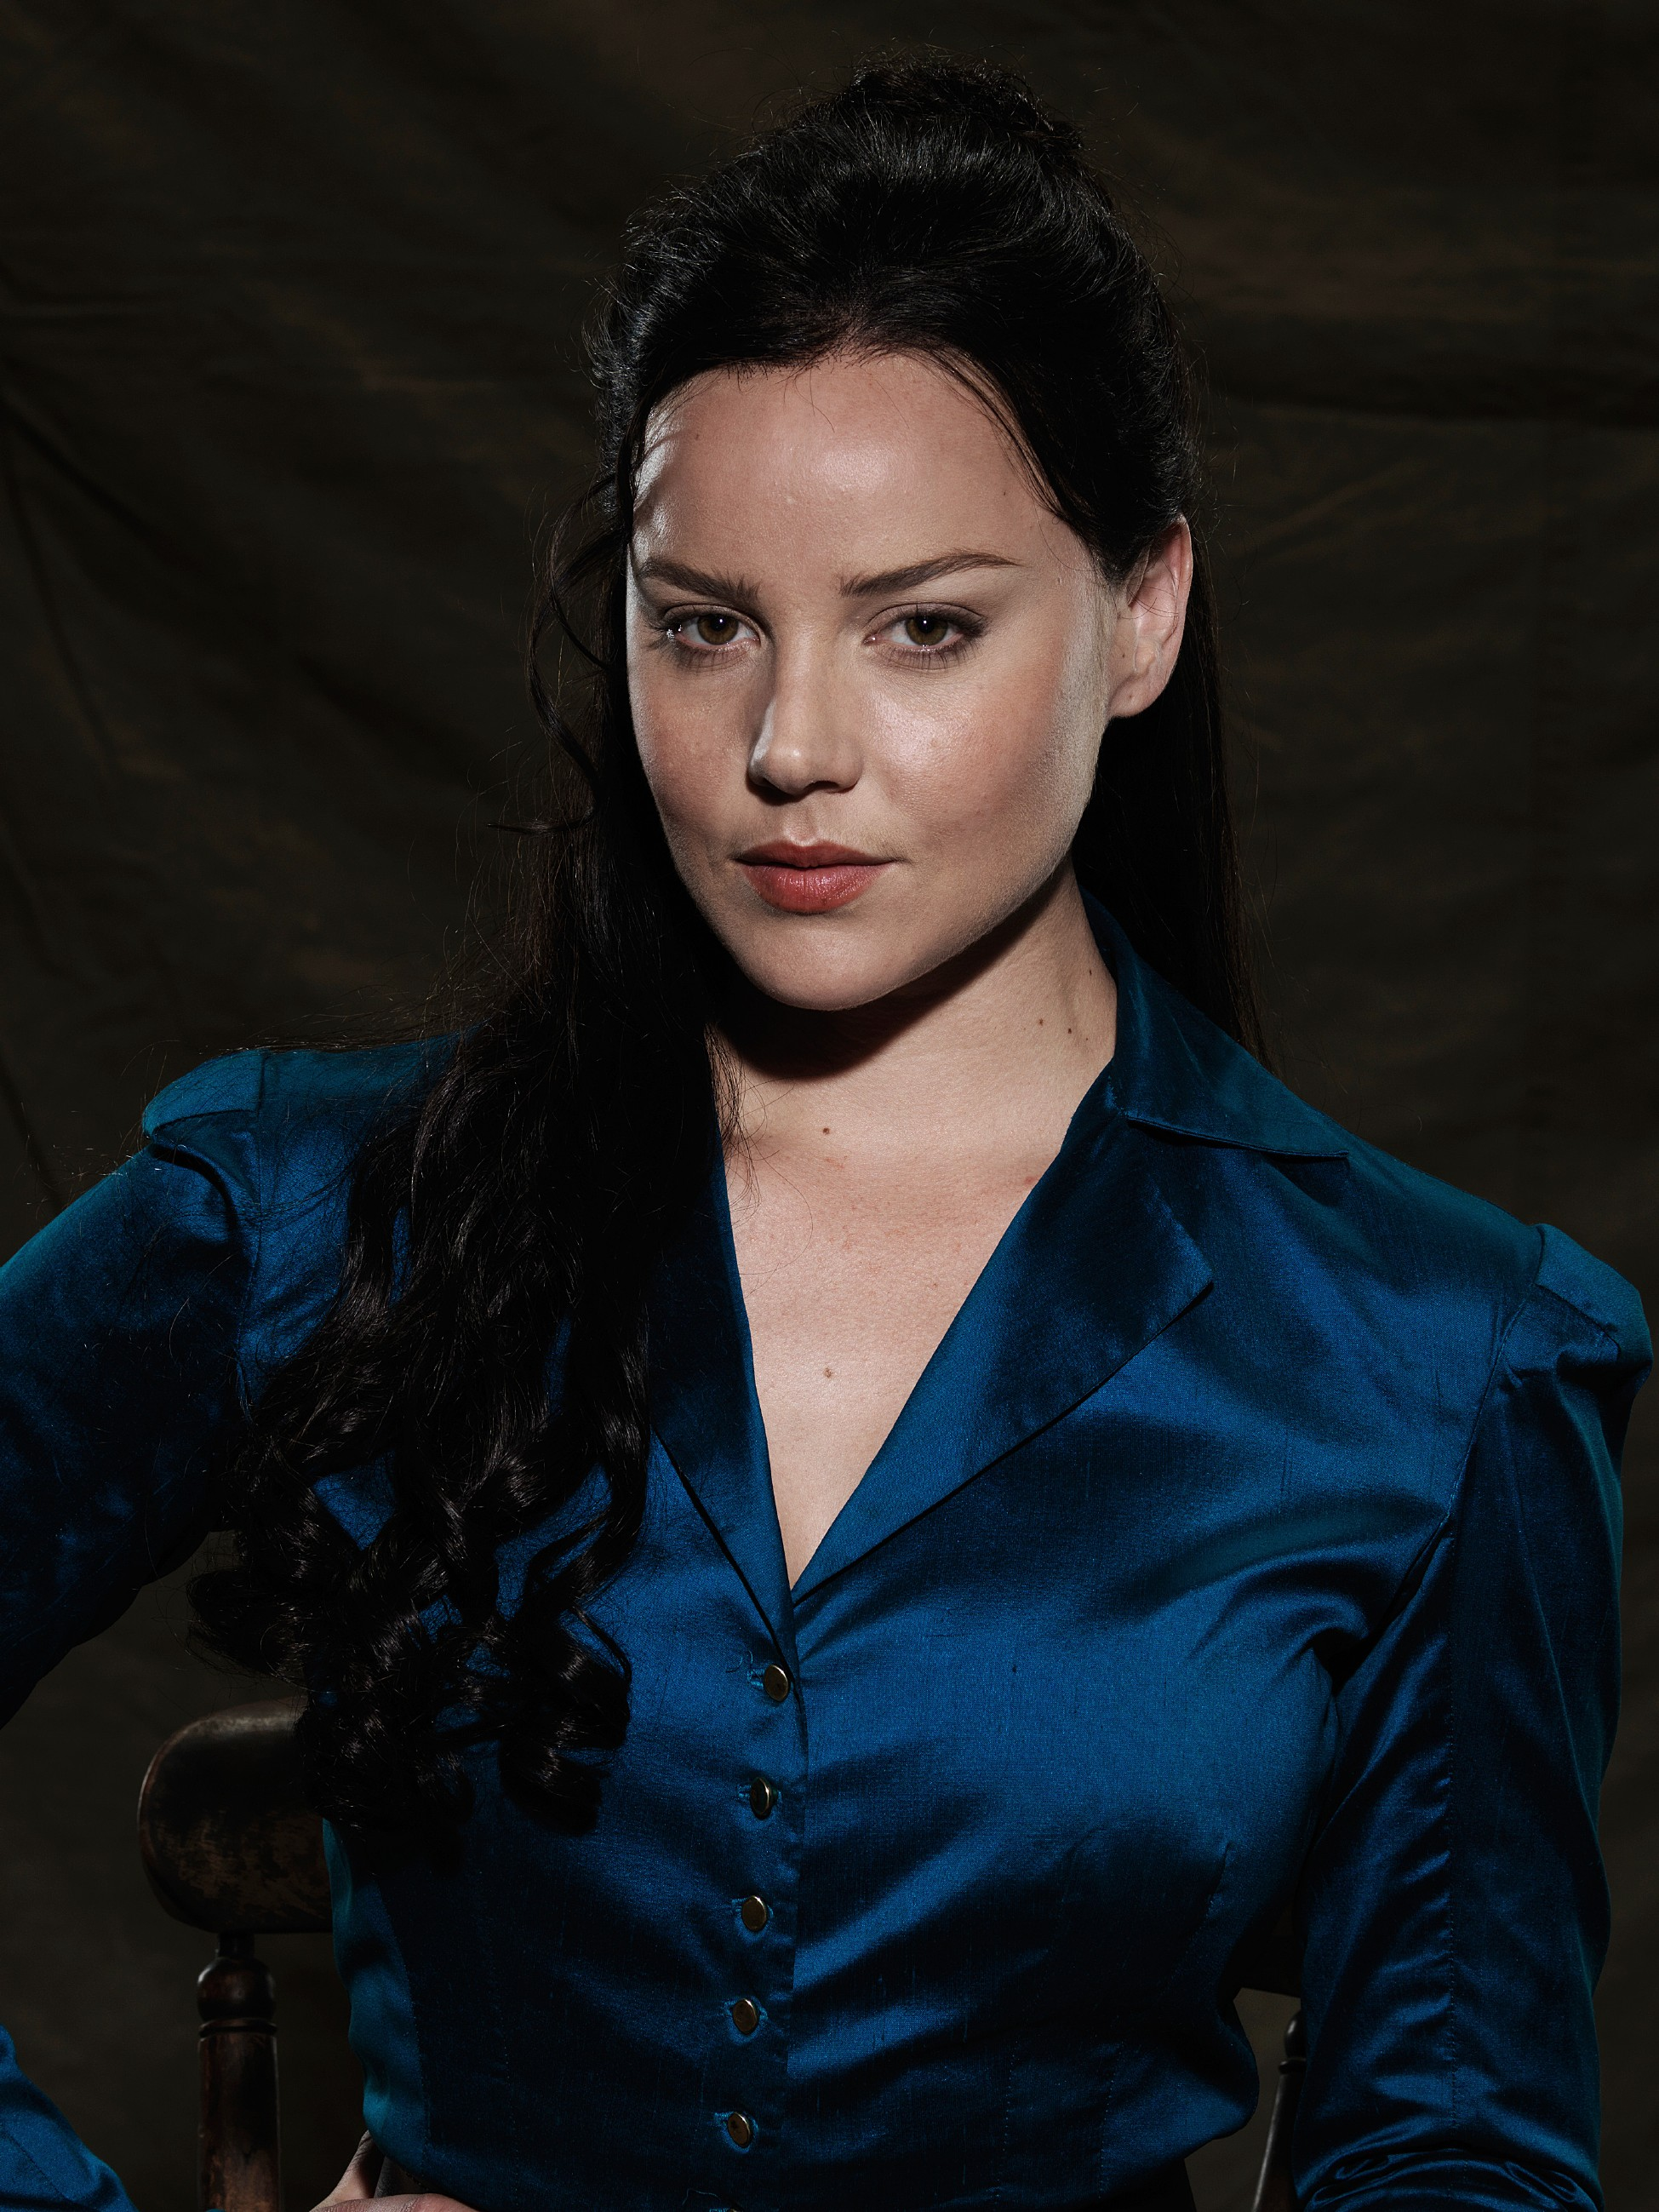 Abbie Cornish as Belinda Mulrooney in 'Klondike'